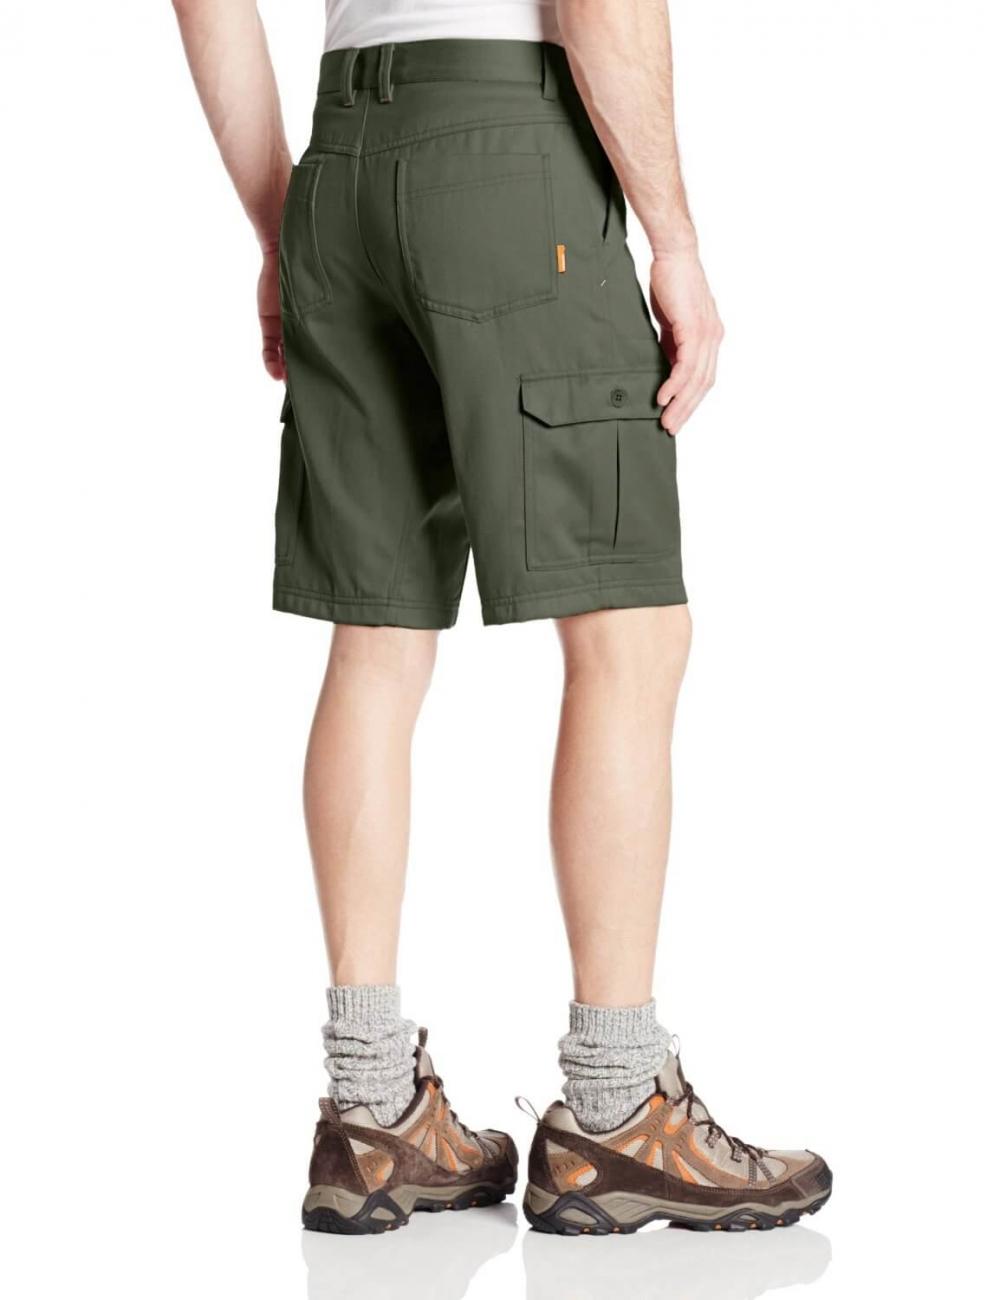 Шорты ICEBREAKER rover shorts (размер 52/L) - 1